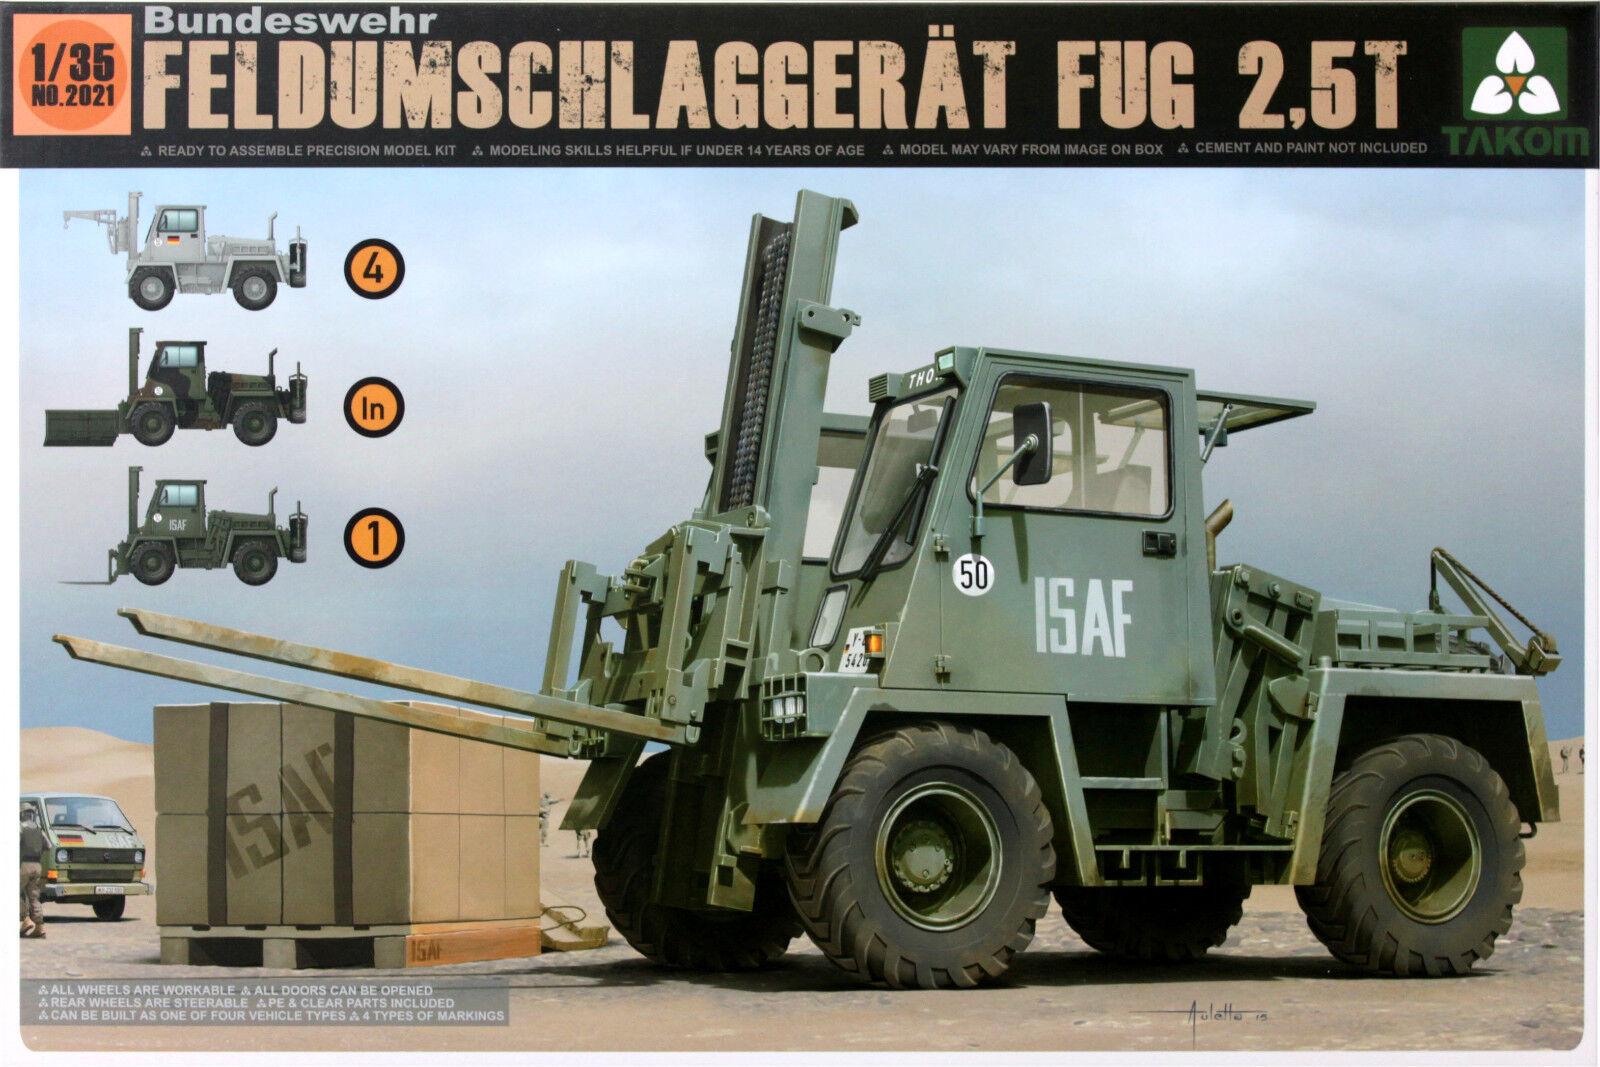 Takom 1 35 German Bundeswehr Feldumschlaggerat FUG 2.5T